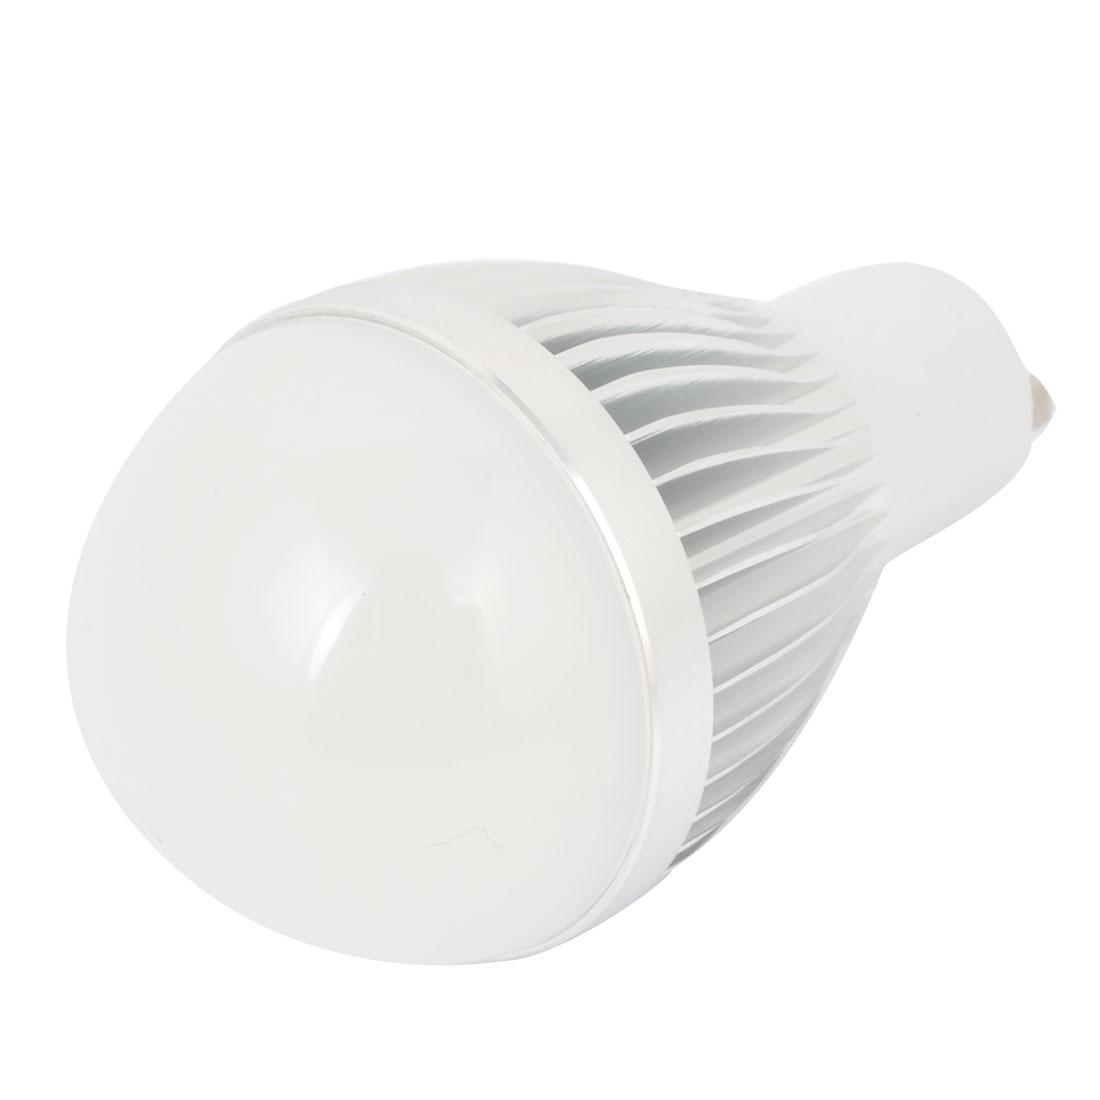 AC 85-220V 1W GU10 Base Energy Saving Globe Ball Bulb 6000K Pure White LED Lamp